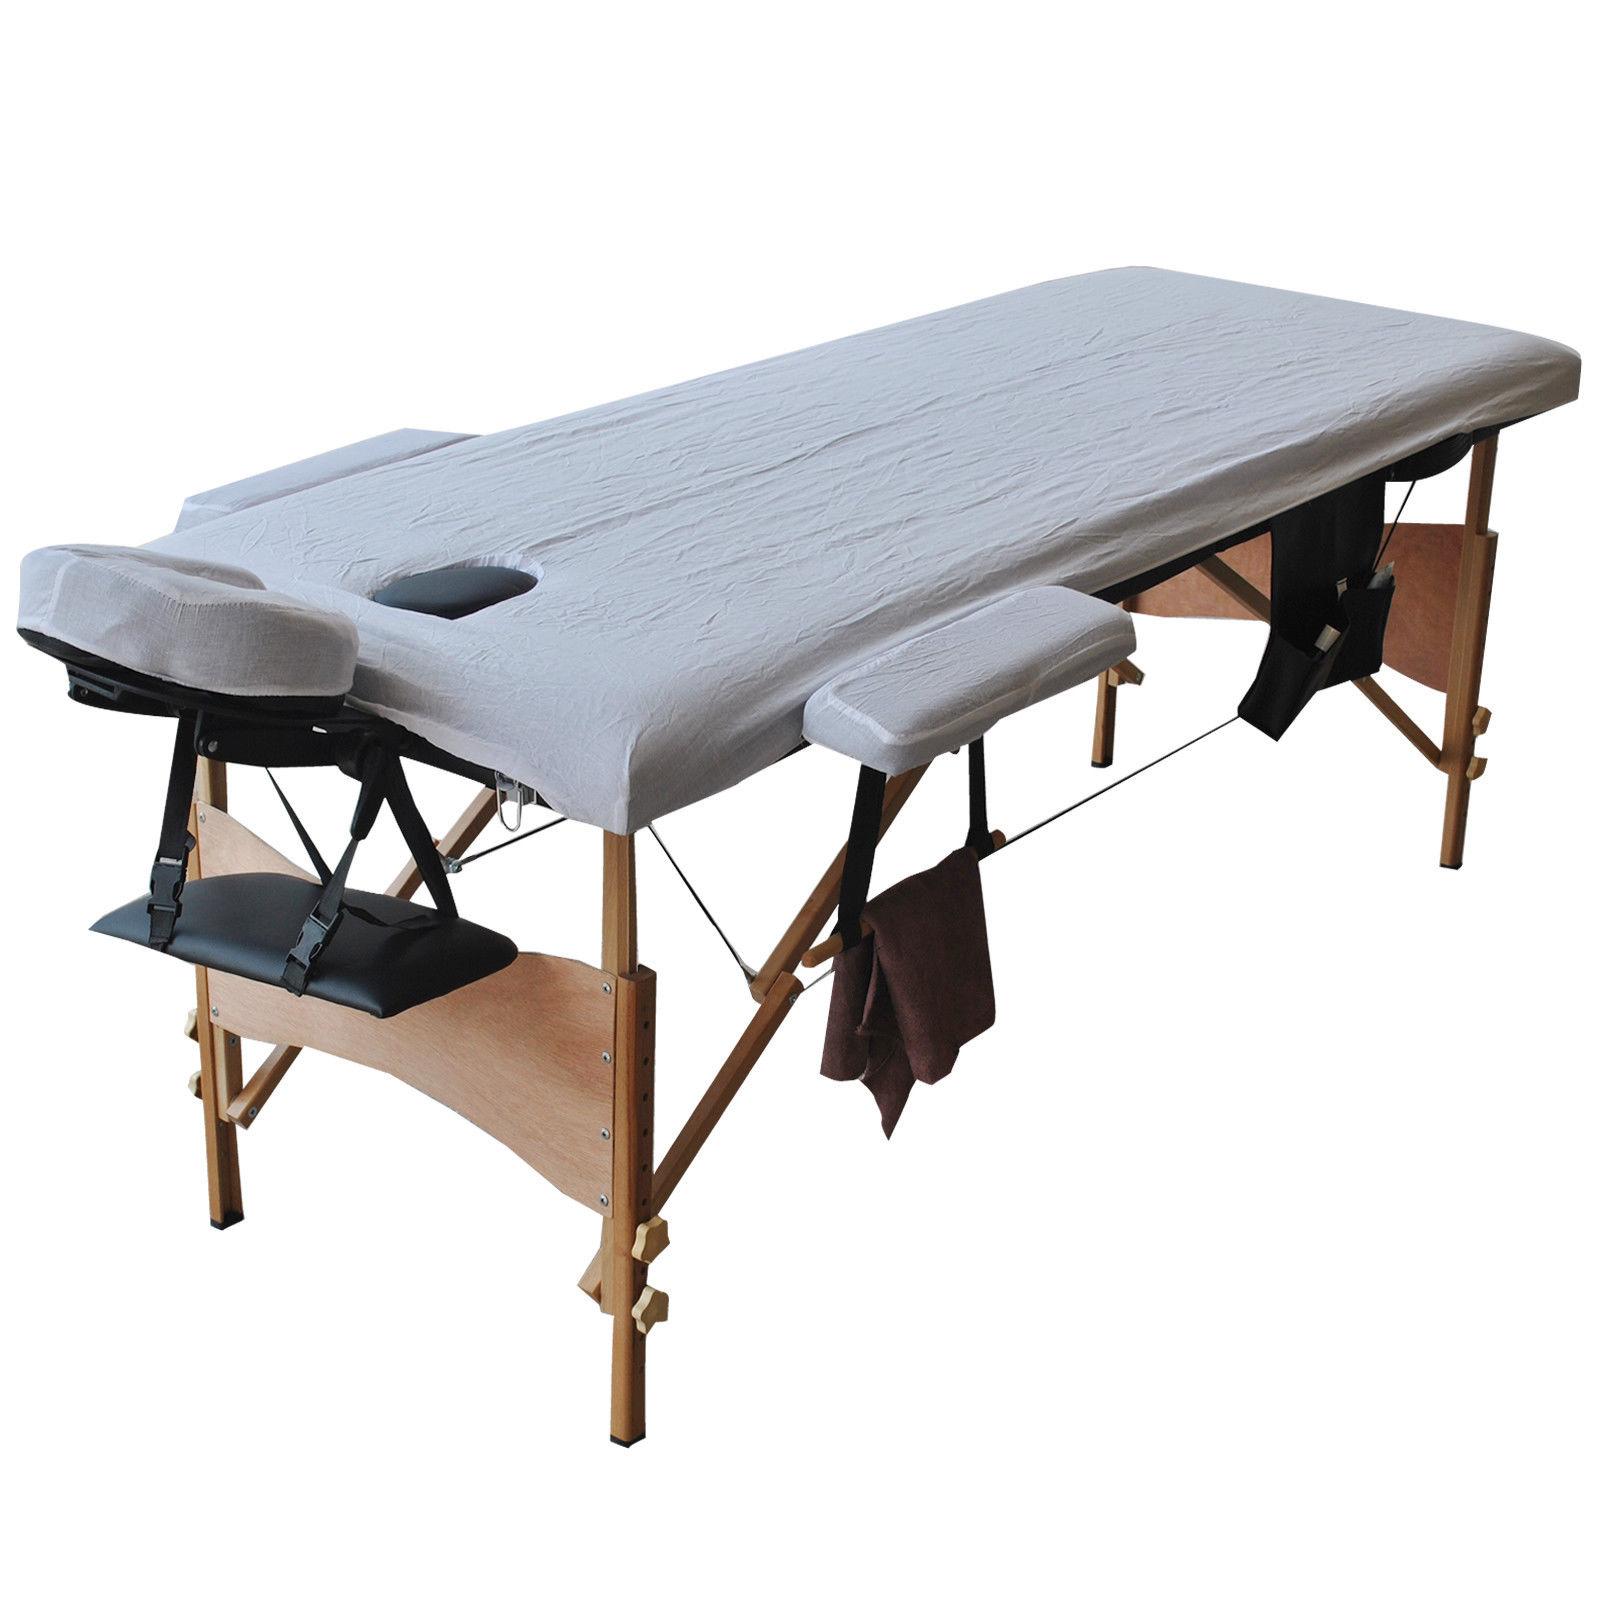 84 Quot L Massage Table Portable Facial Spa Bed W Sheet Cradle